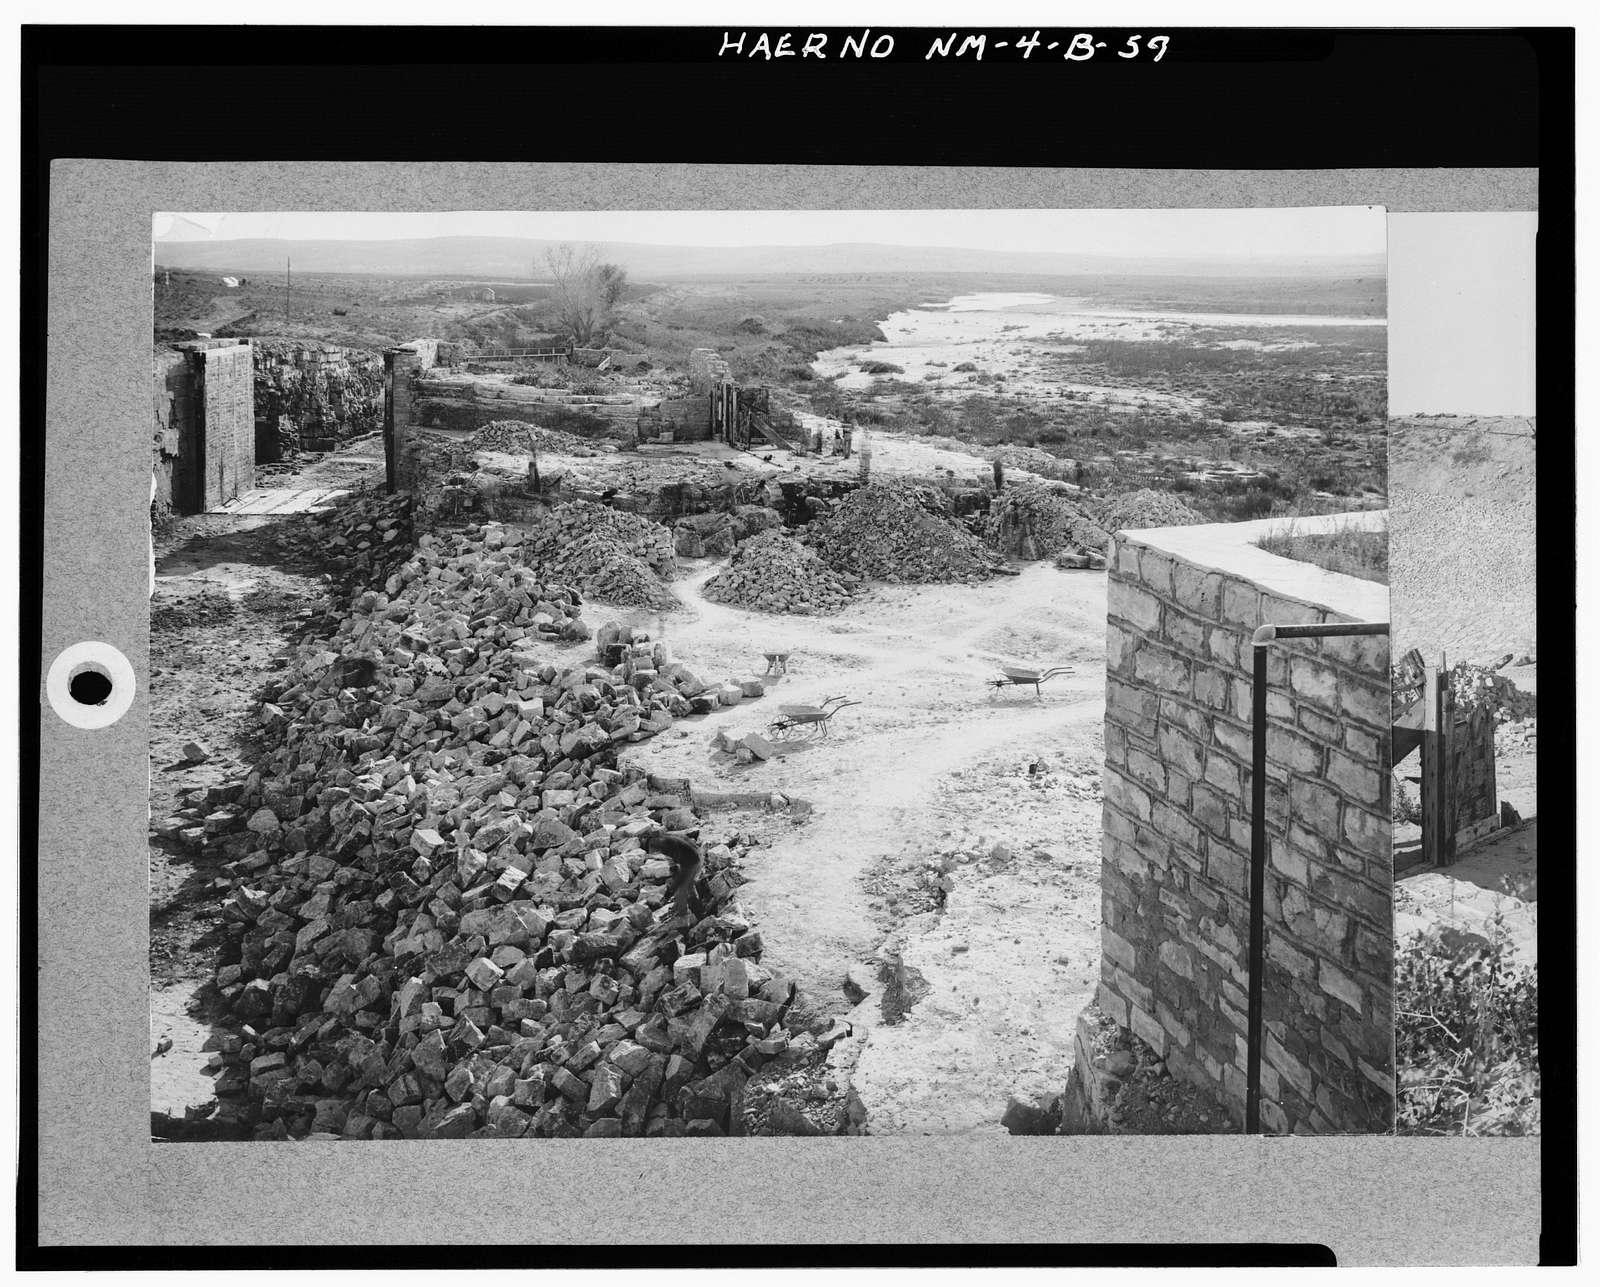 Carlsbad Irrigation District, Avalon Dam, On Pecos River, 4 miles North of Carlsbad, Carlsbad, Eddy County, NM